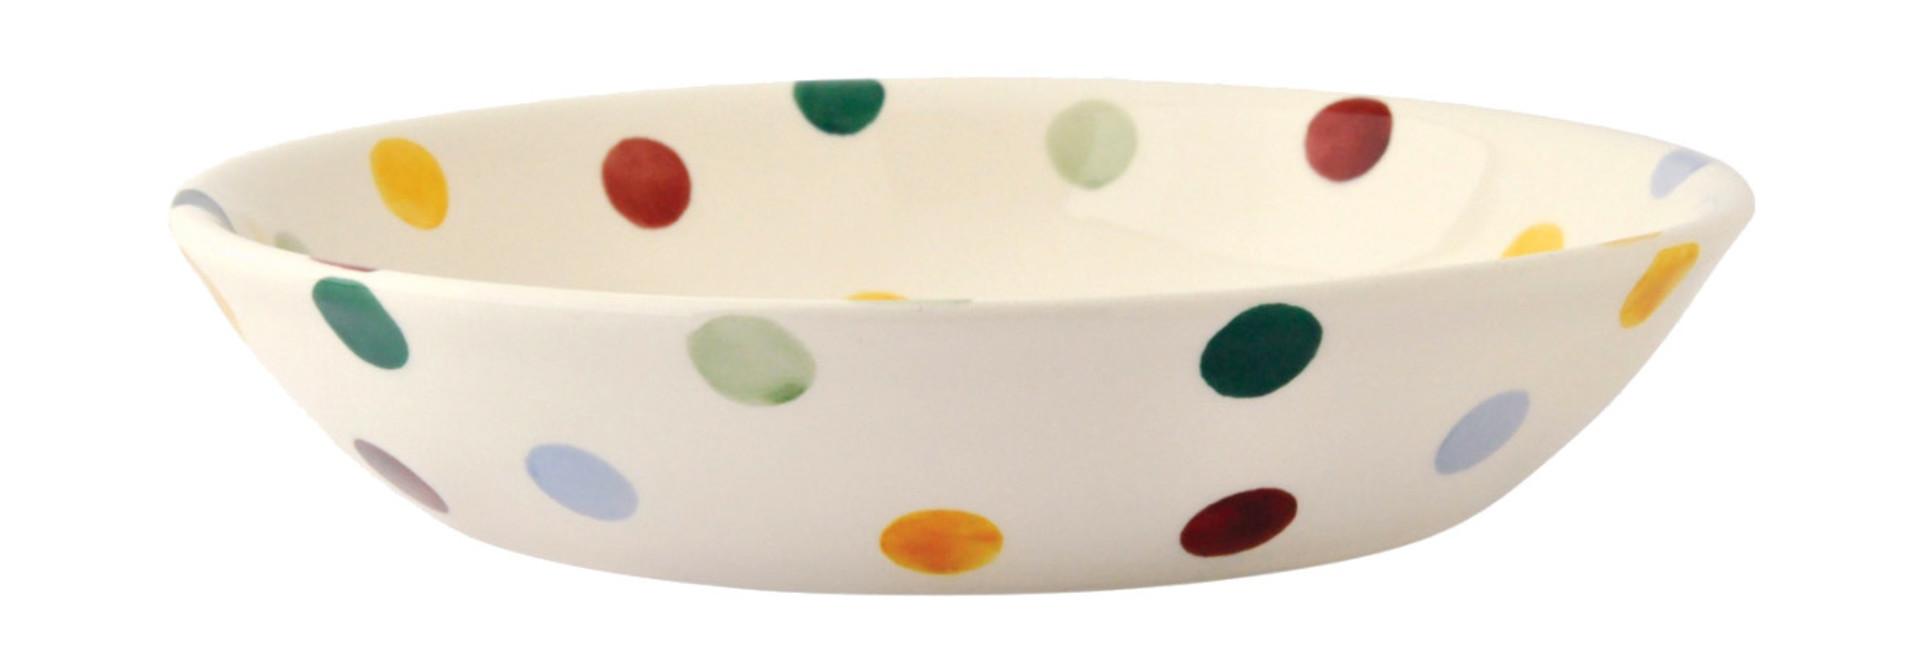 Pasta Bowl Sm- Polka Dot